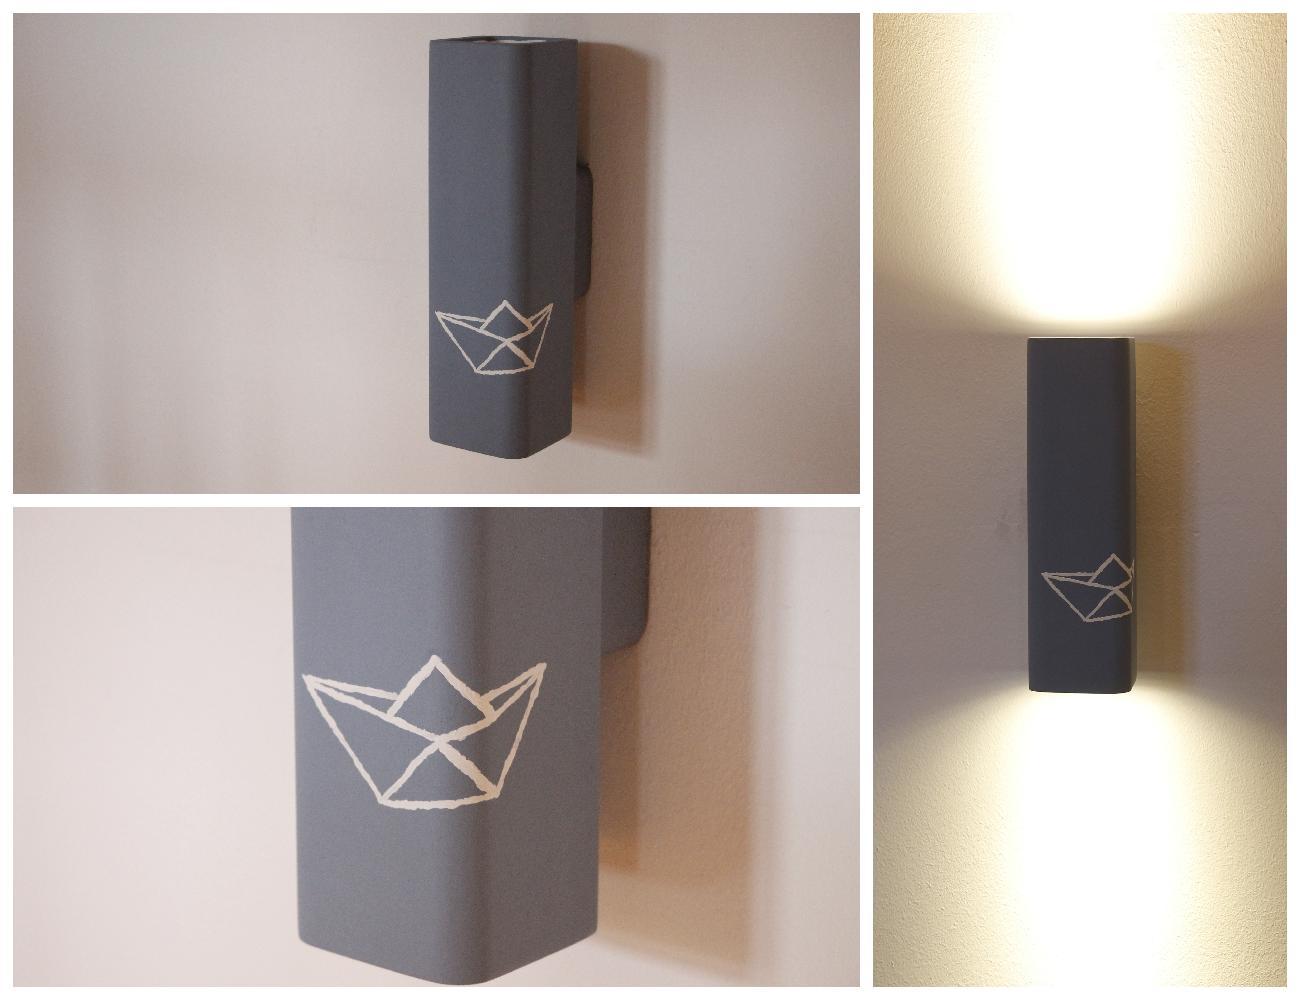 diy mit famlights leuchten zu mehr individualit t an der wand lavendelblog. Black Bedroom Furniture Sets. Home Design Ideas